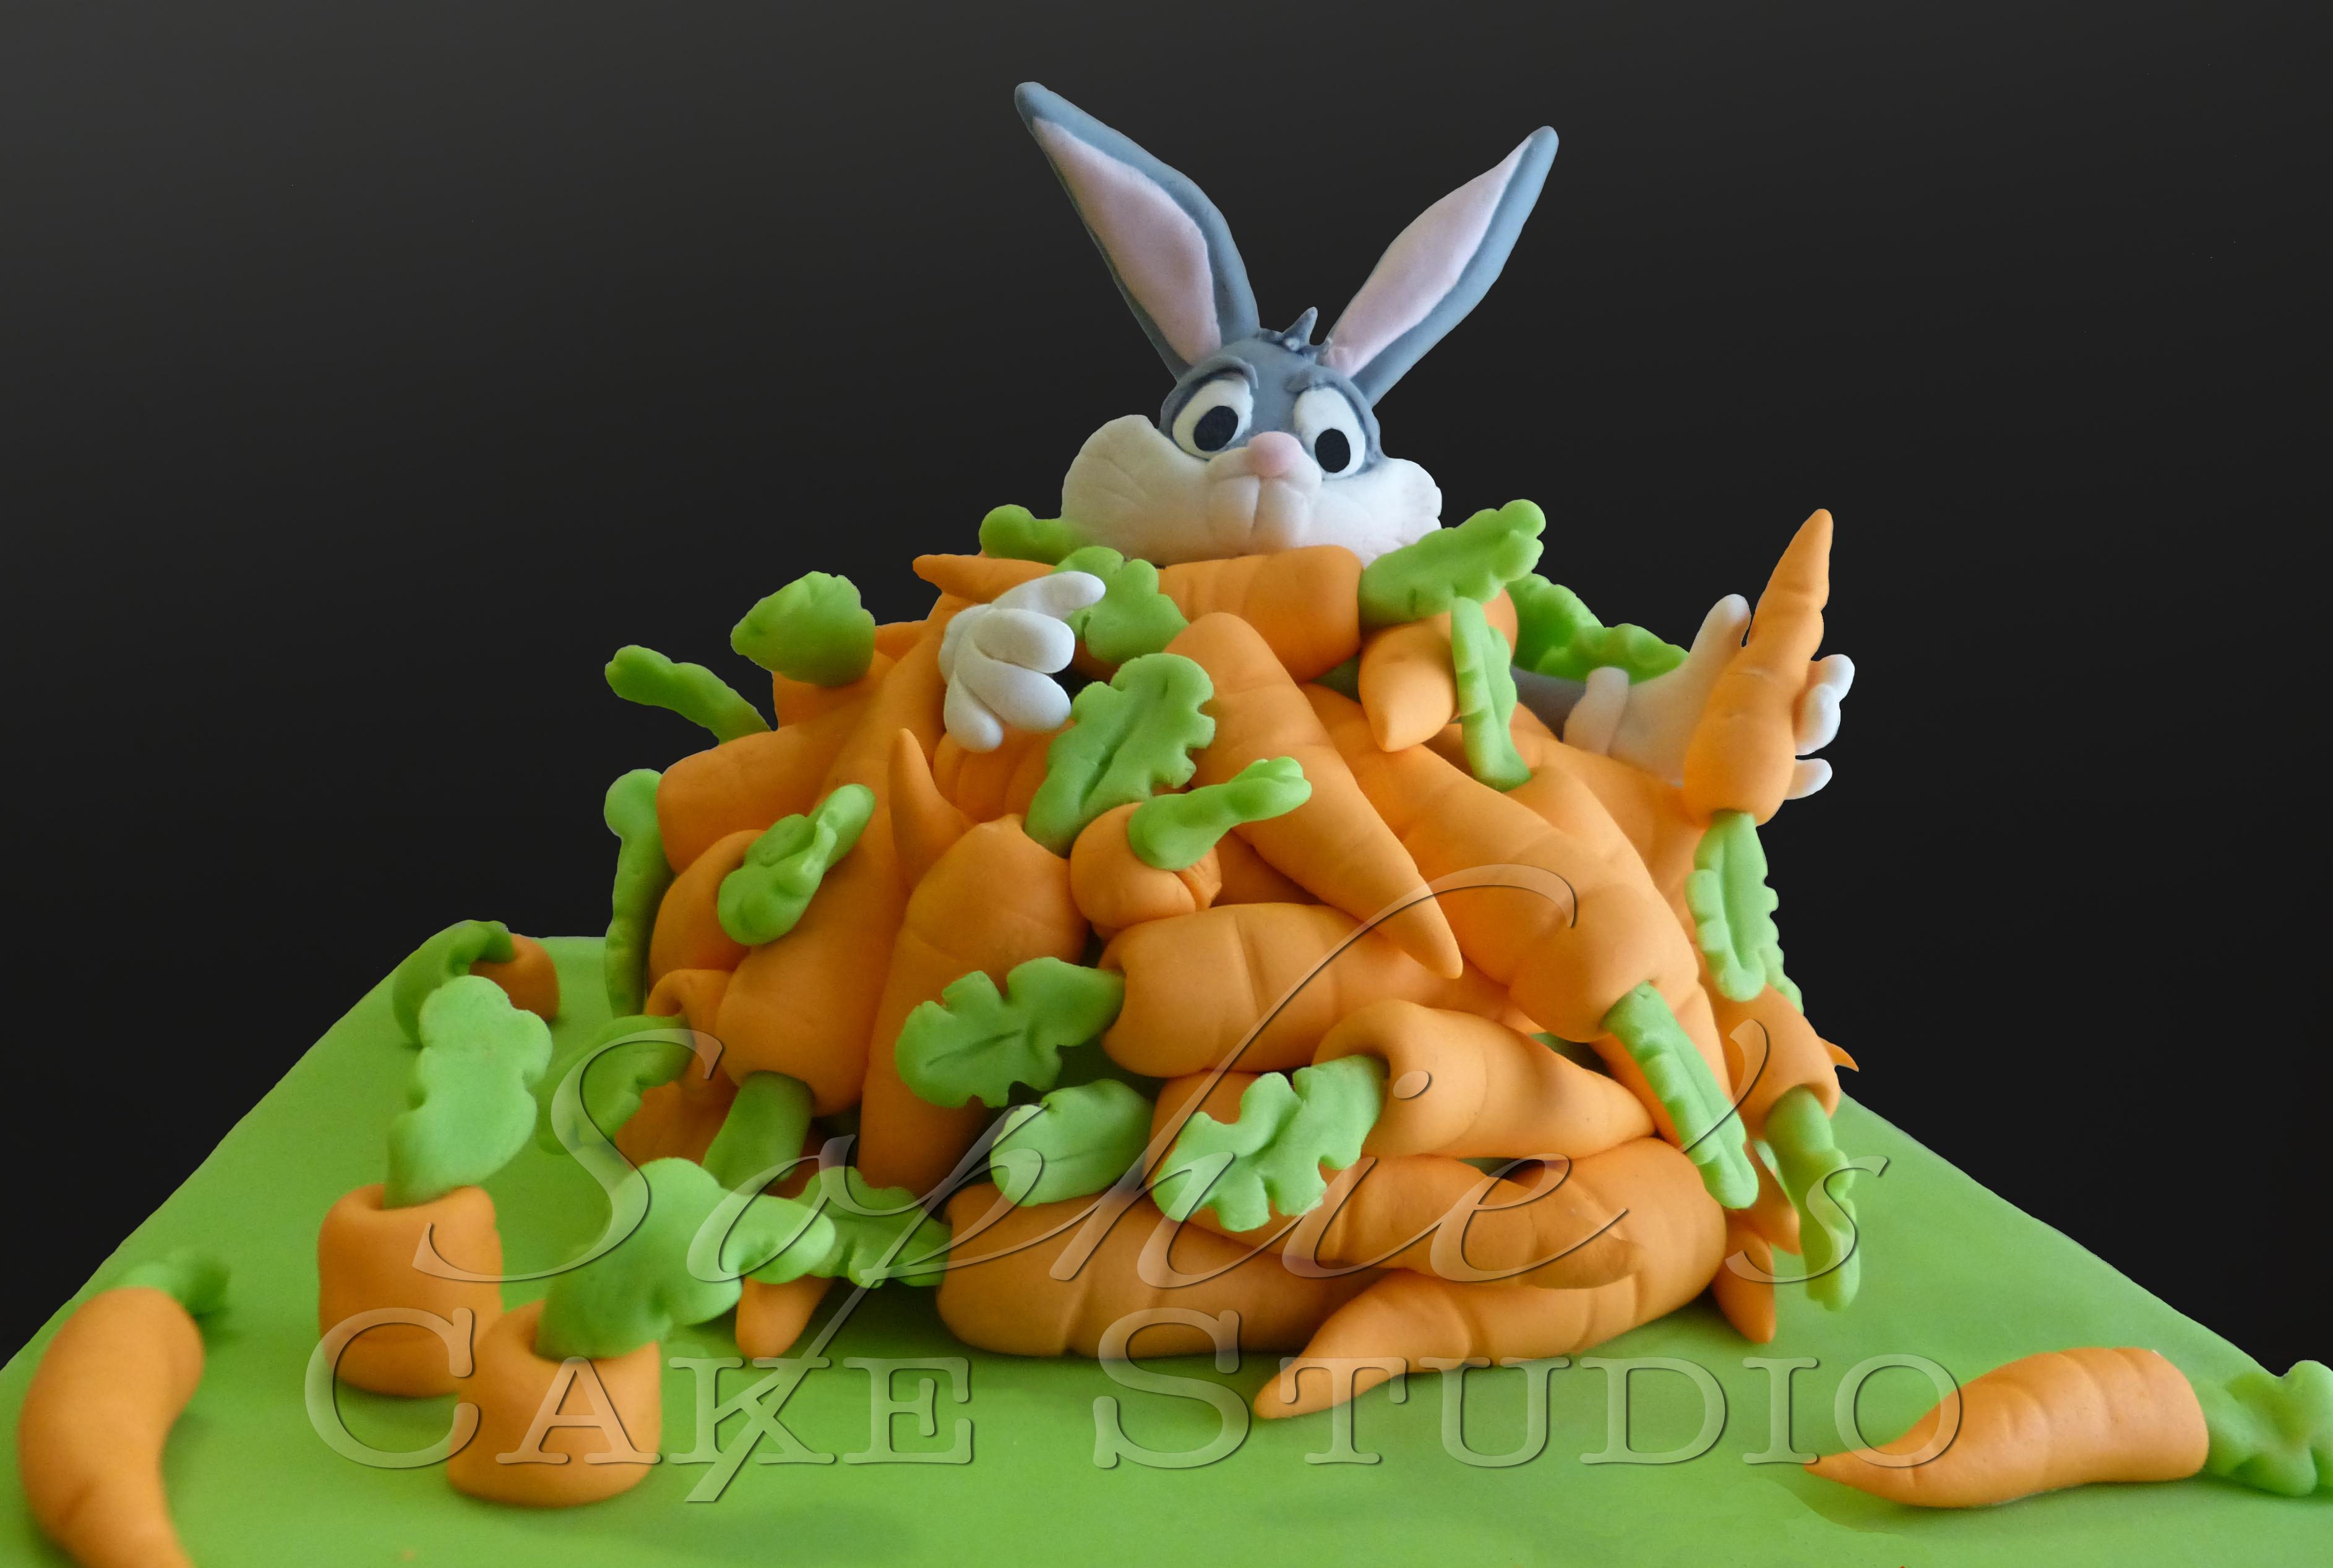 bugs bunny watermark